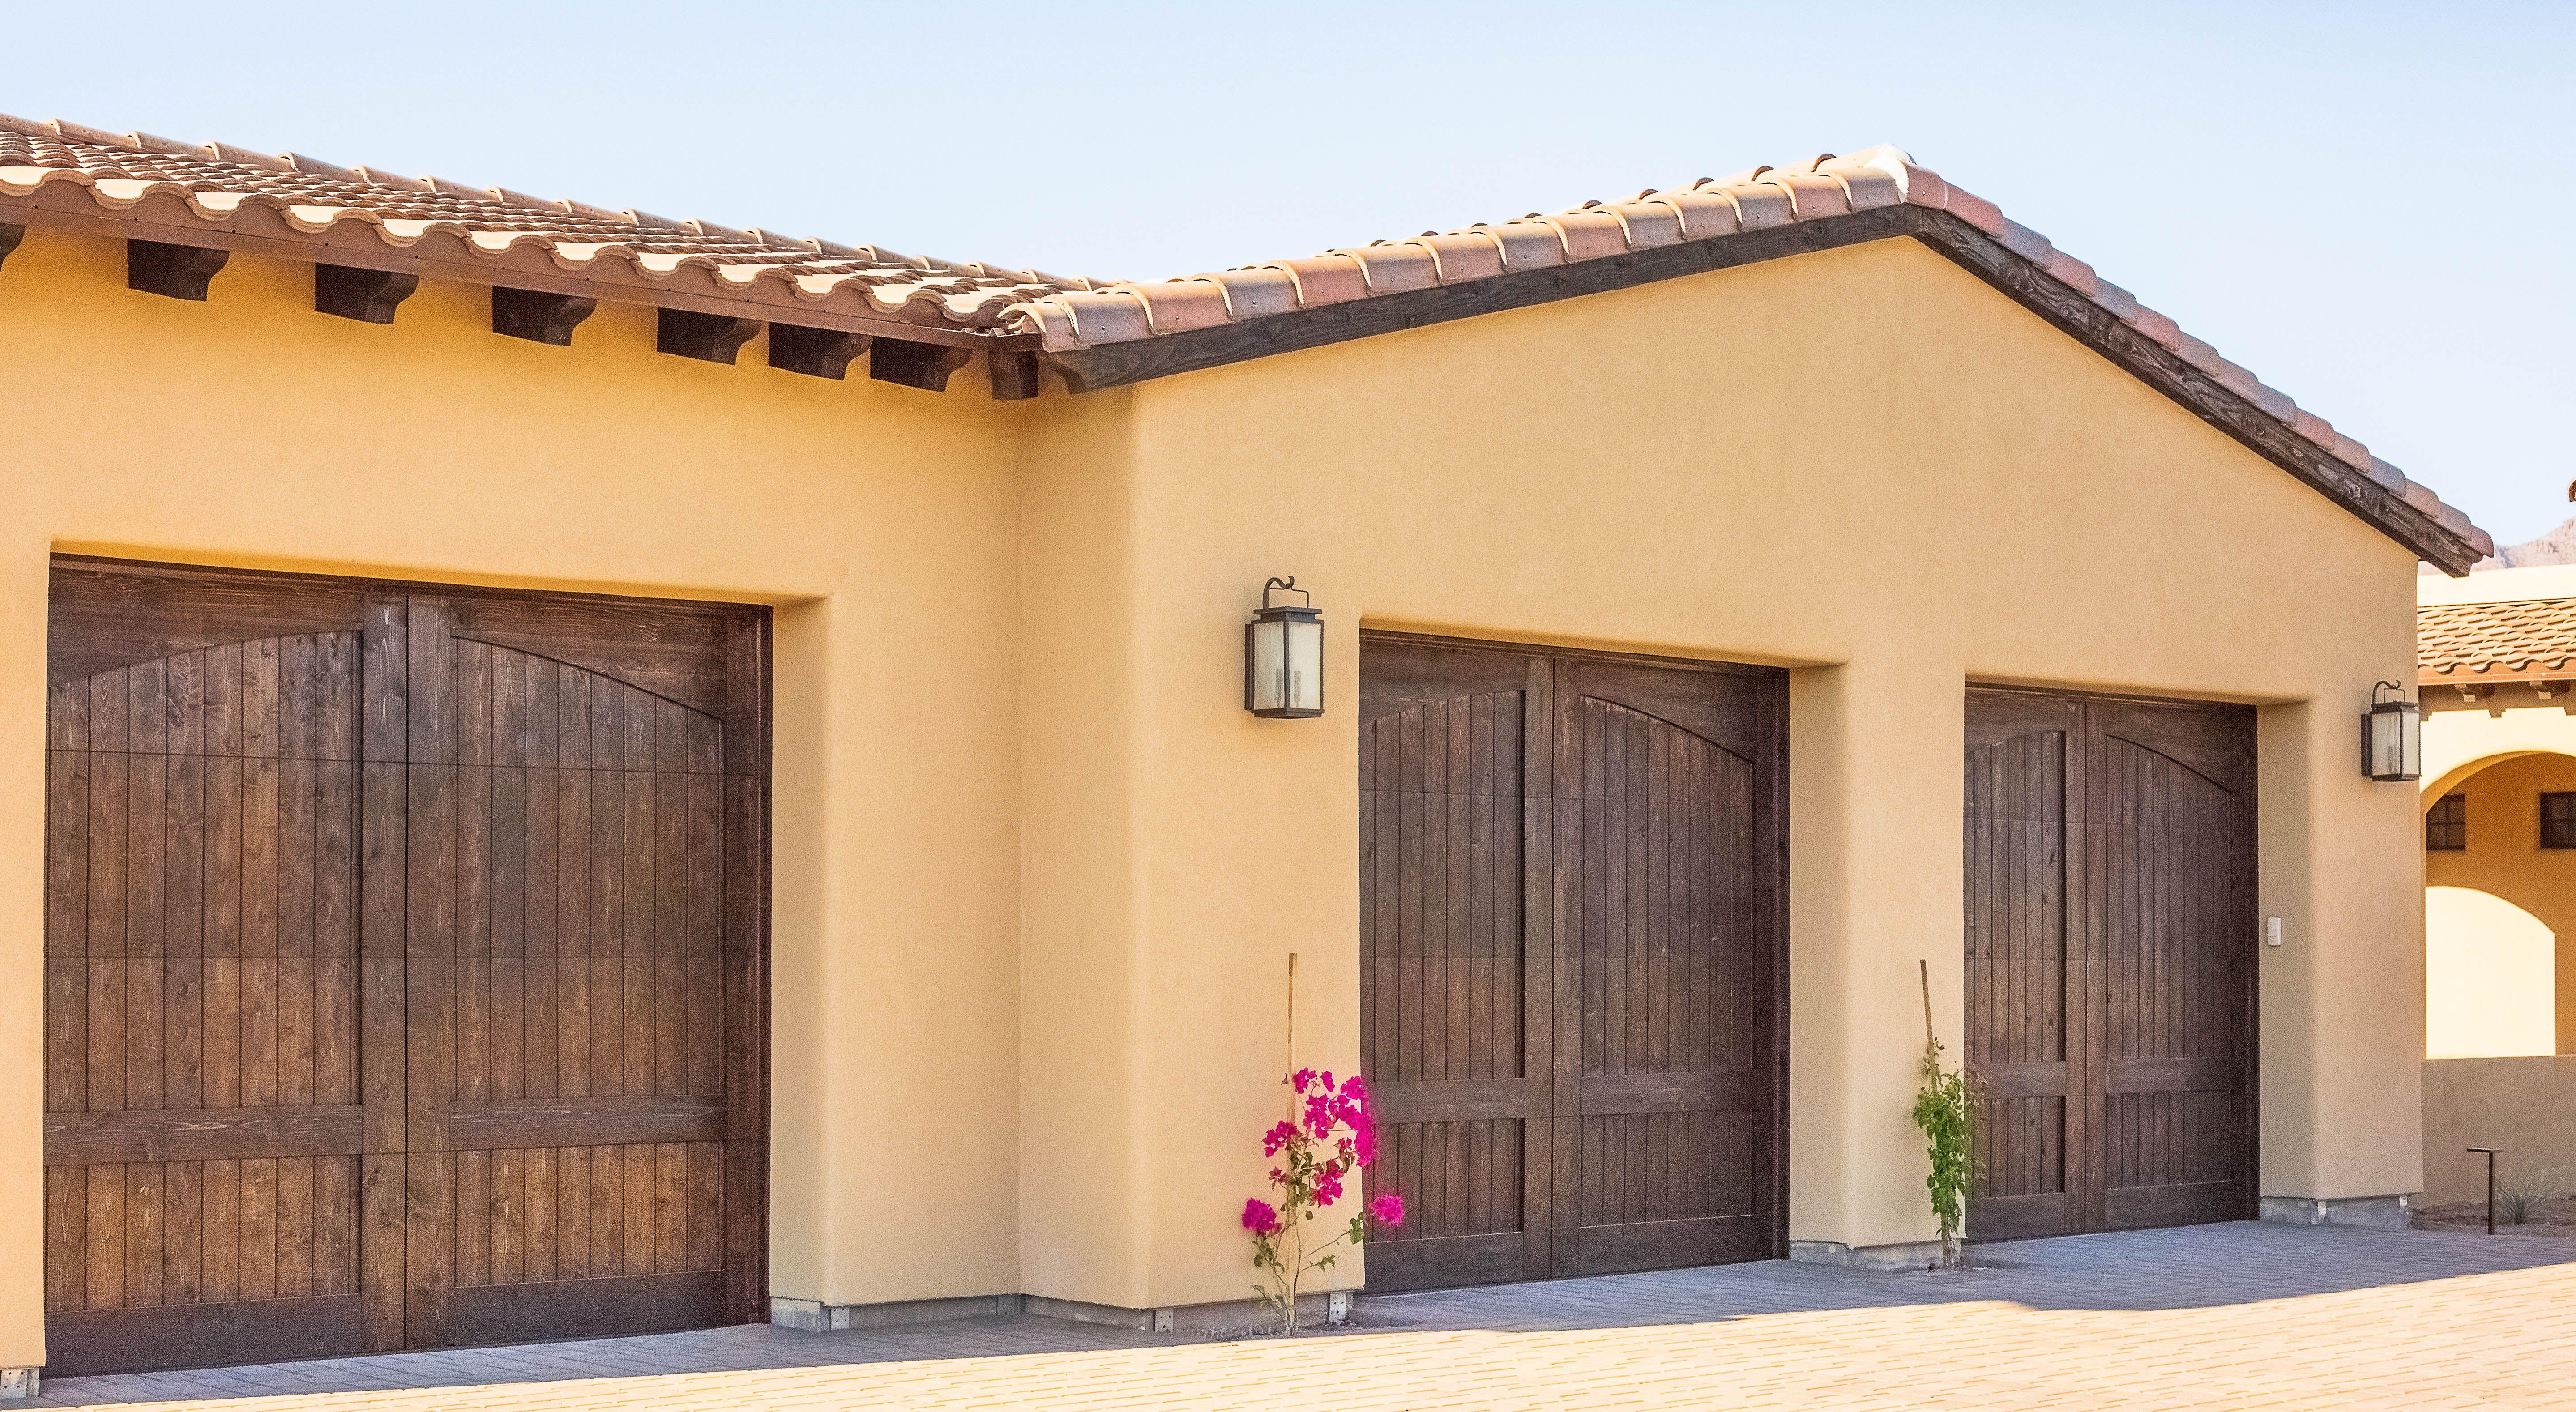 Custom Wood Overlay Garage Doors In Beautiful Scottsdale Arizona